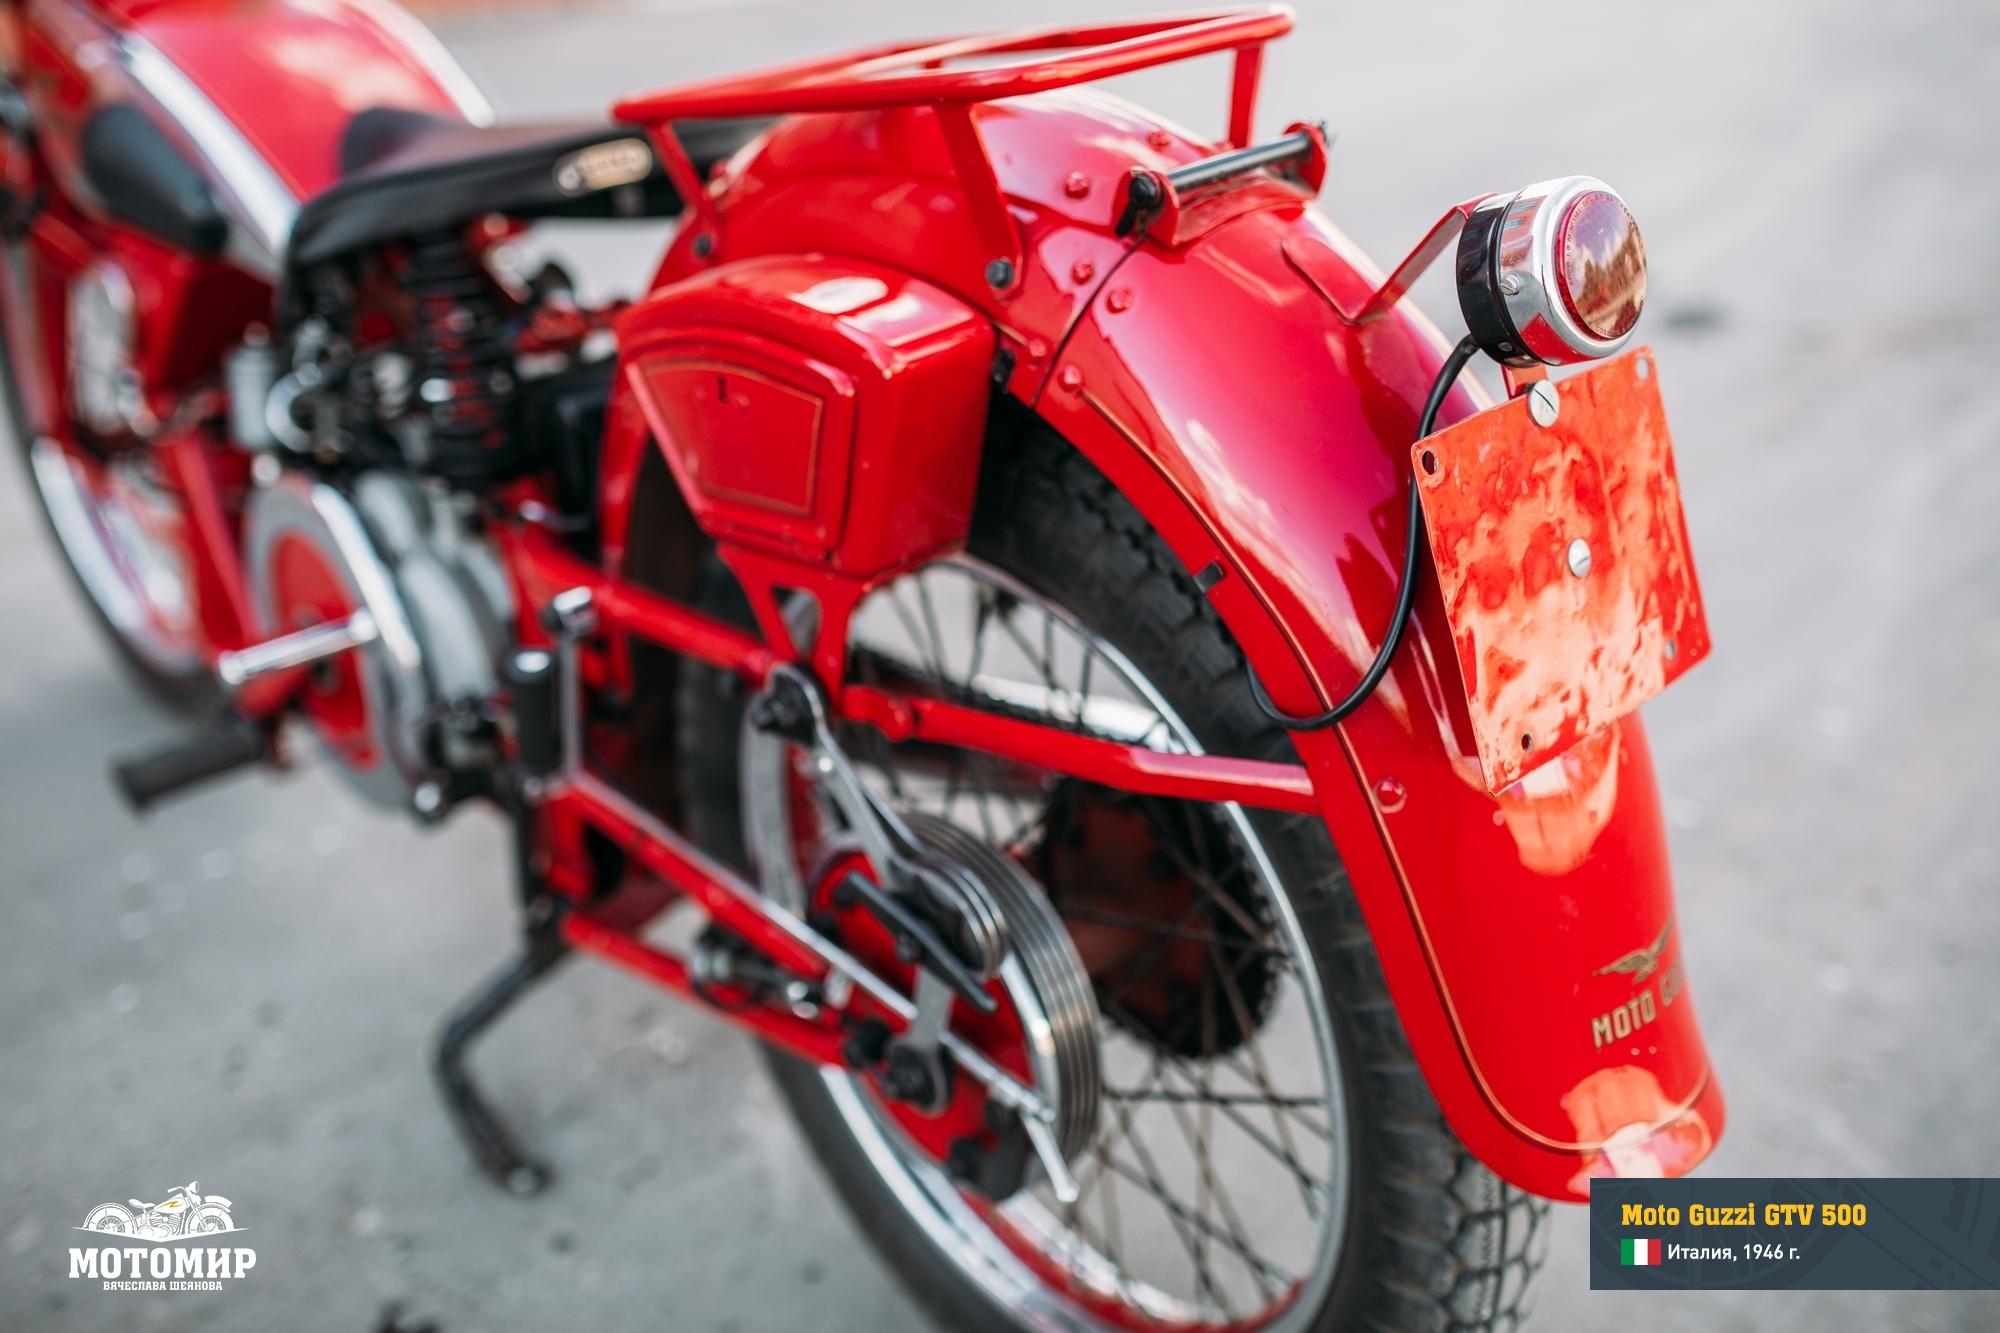 moto-guzzi-gtv-500-201509-web-25